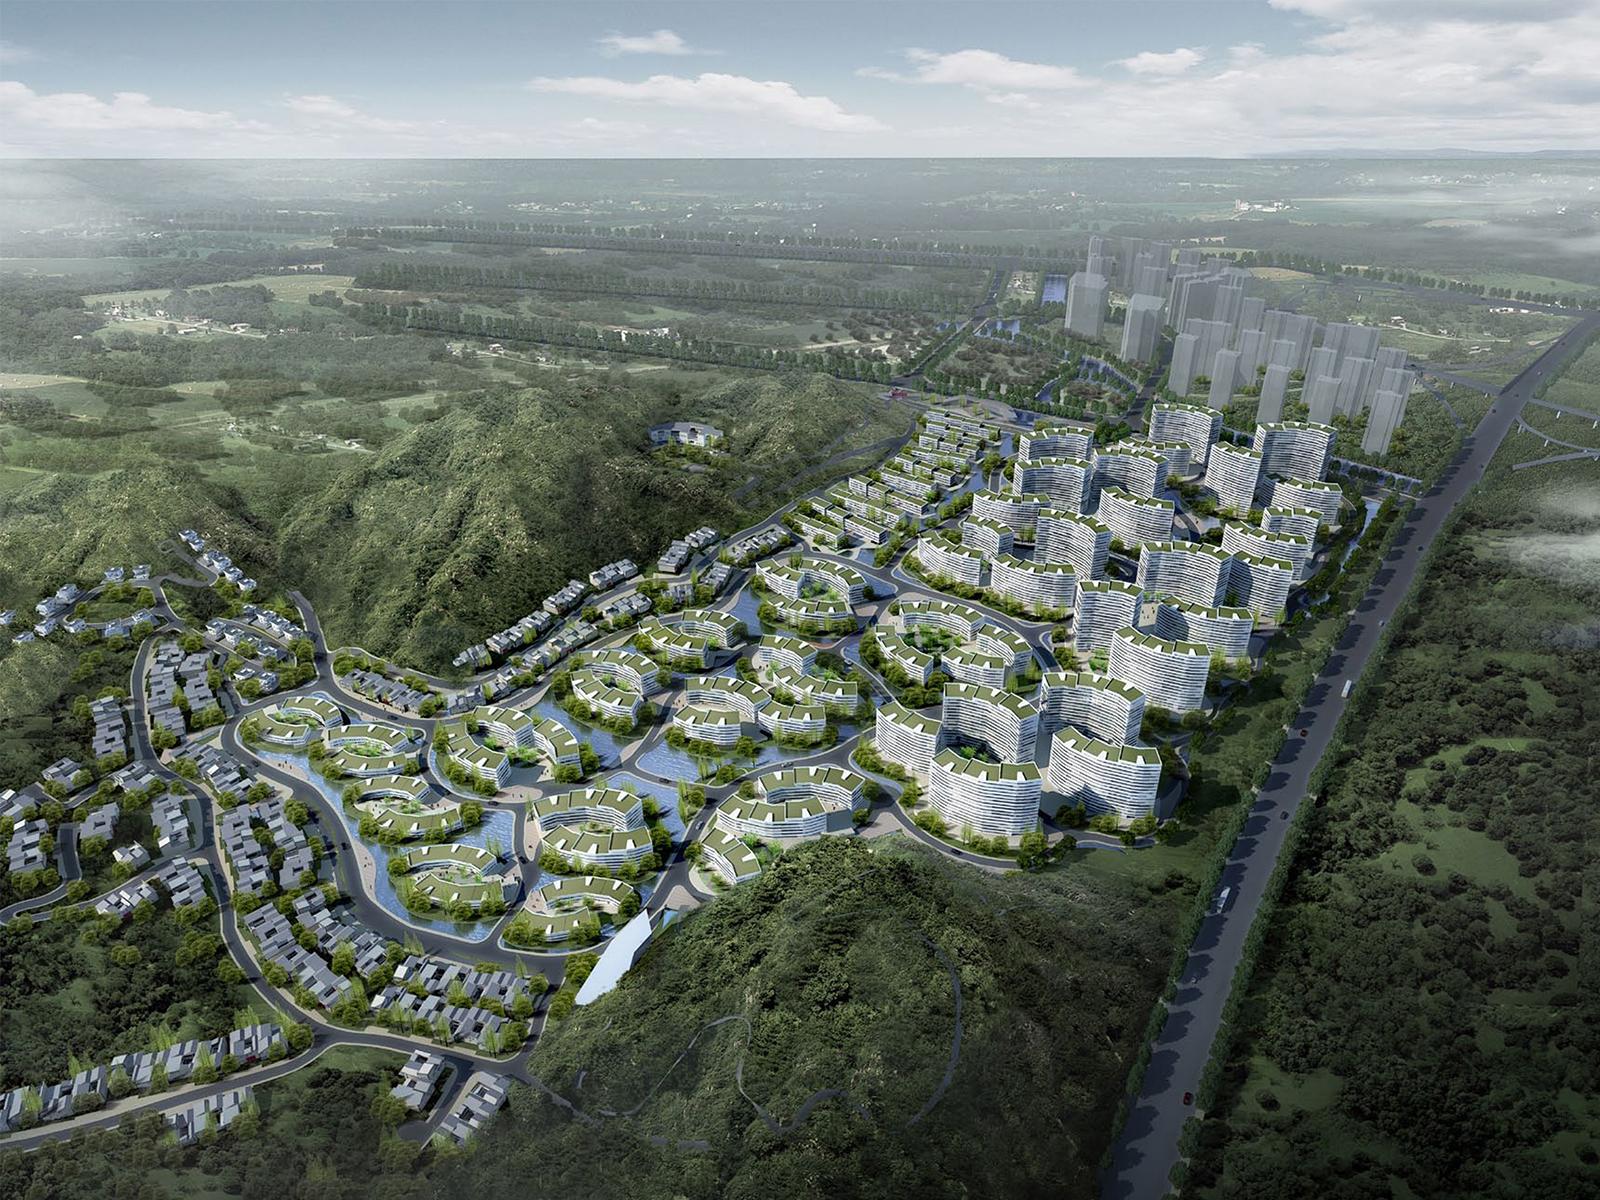 德清保利原乡修建性详规_Poly Deqing Origin Site Planning_Right_01.jpg